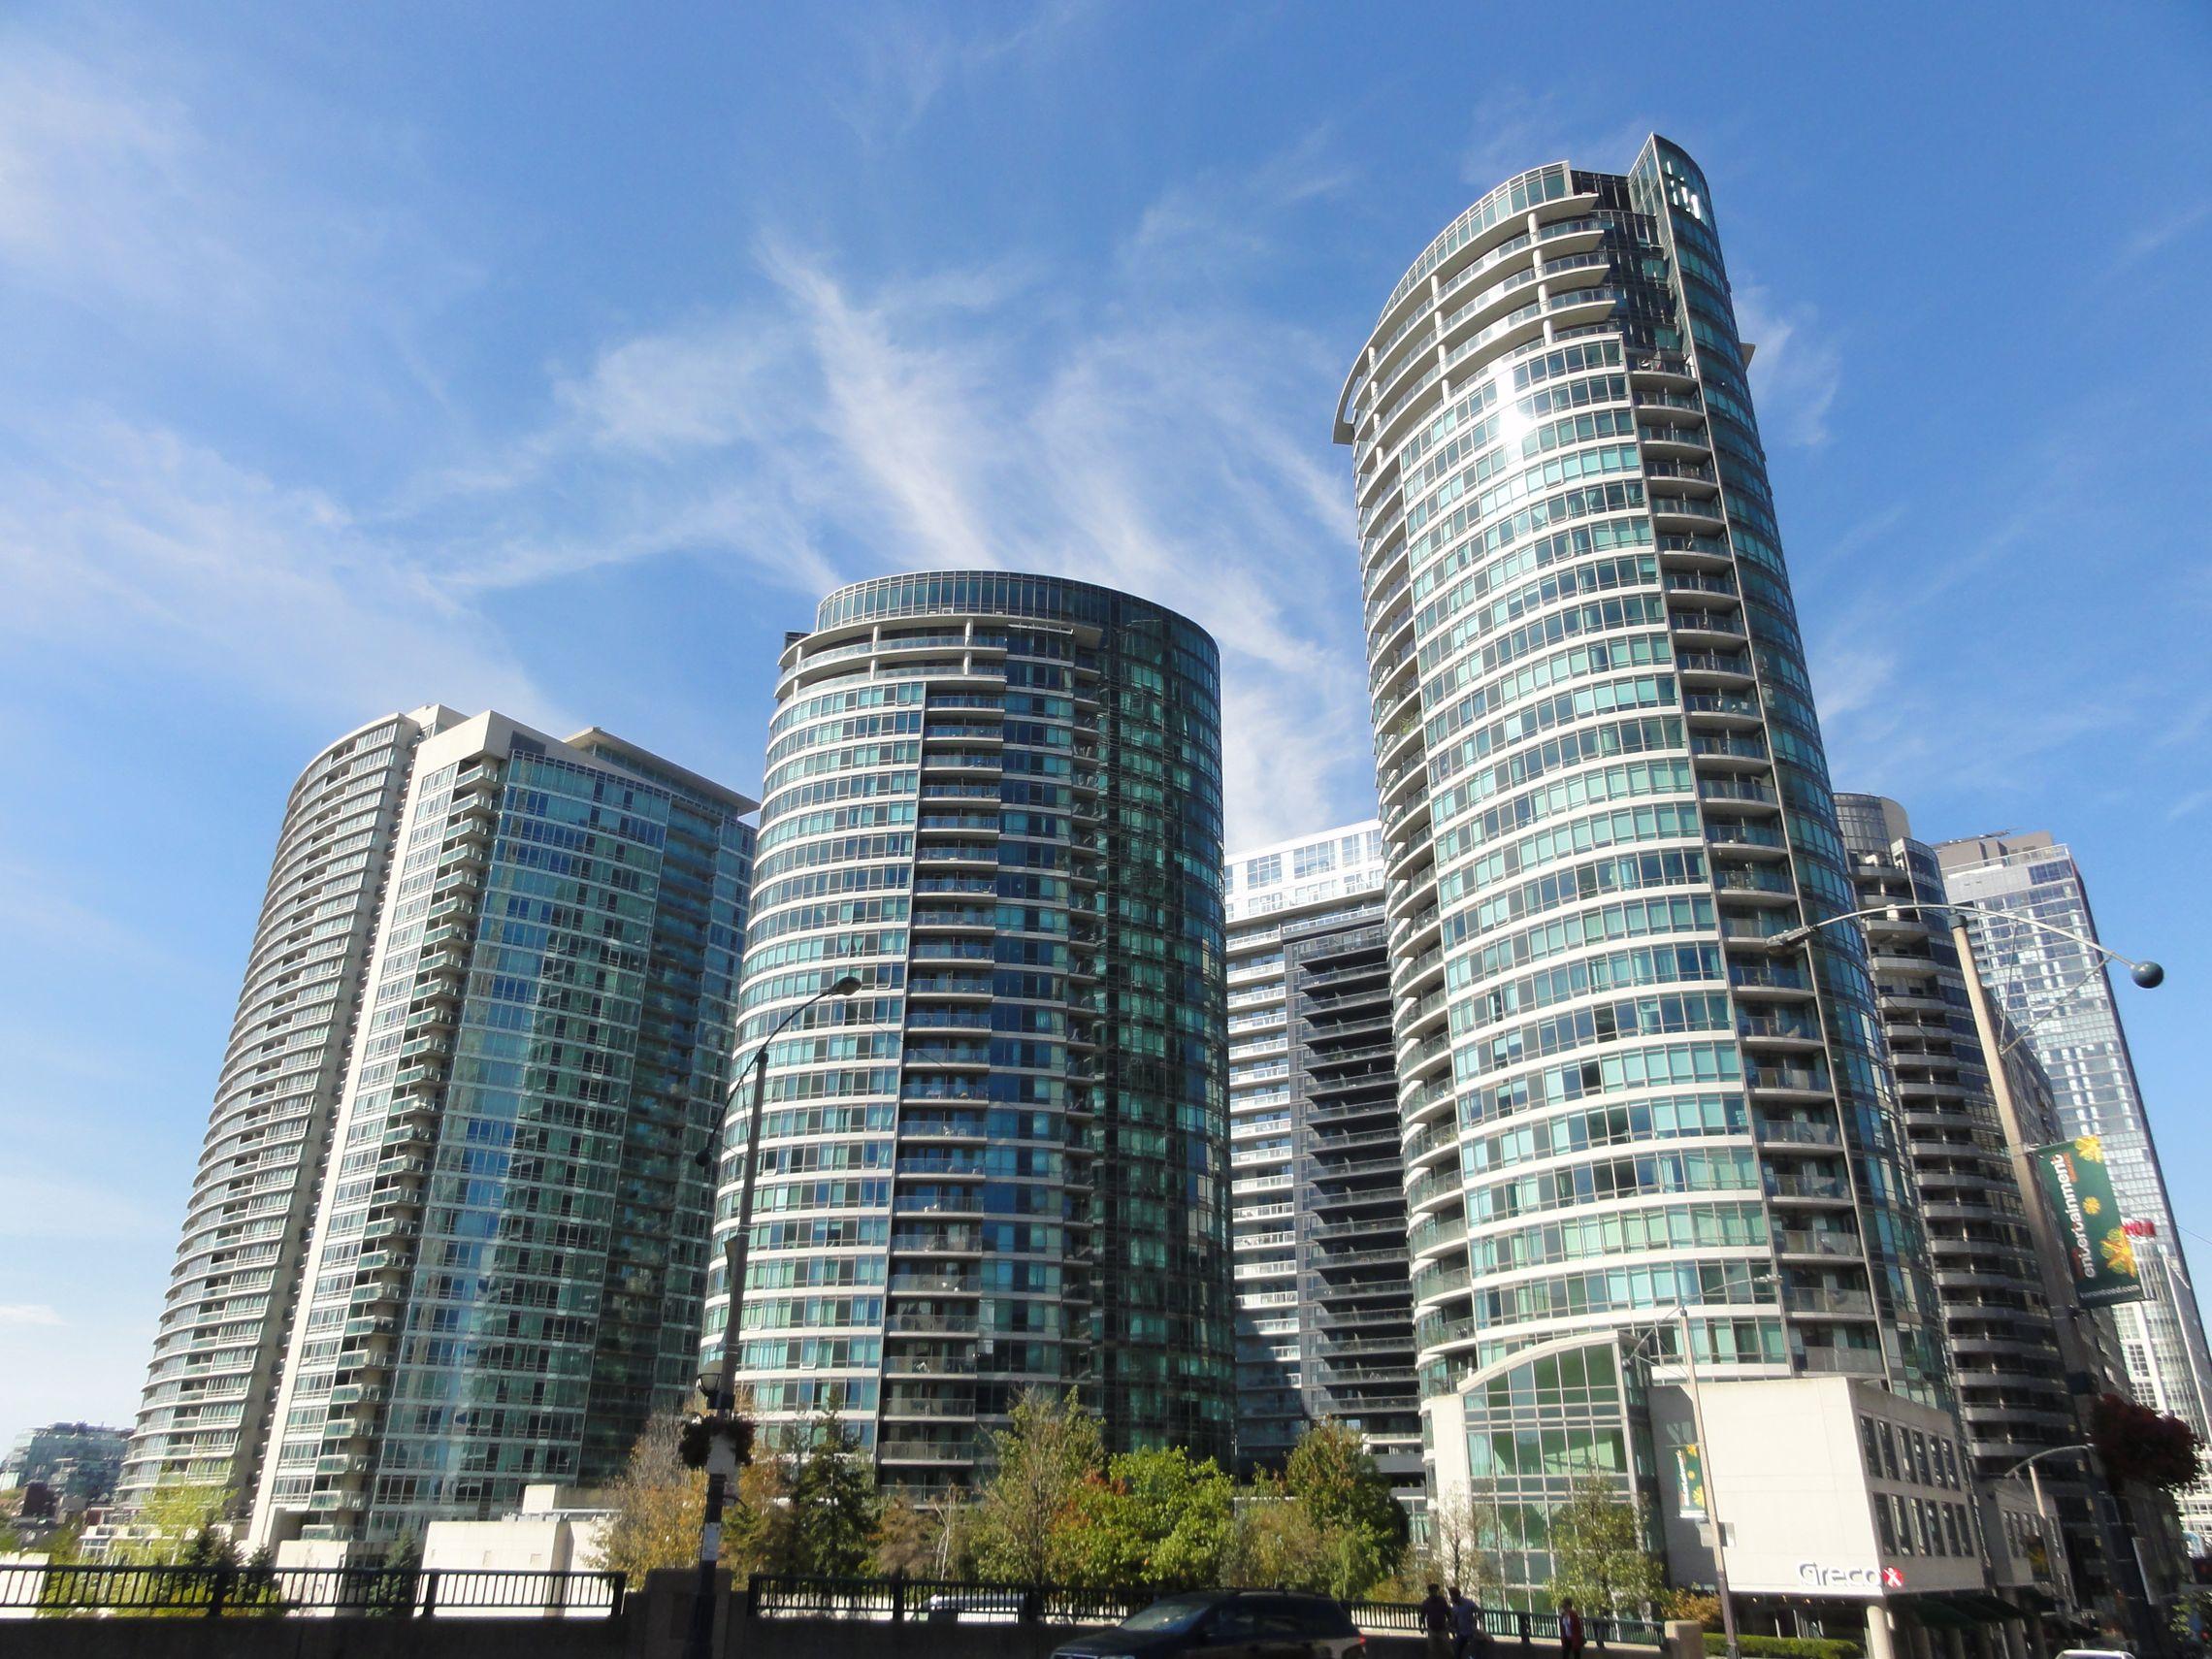 20171002 Toronto 02